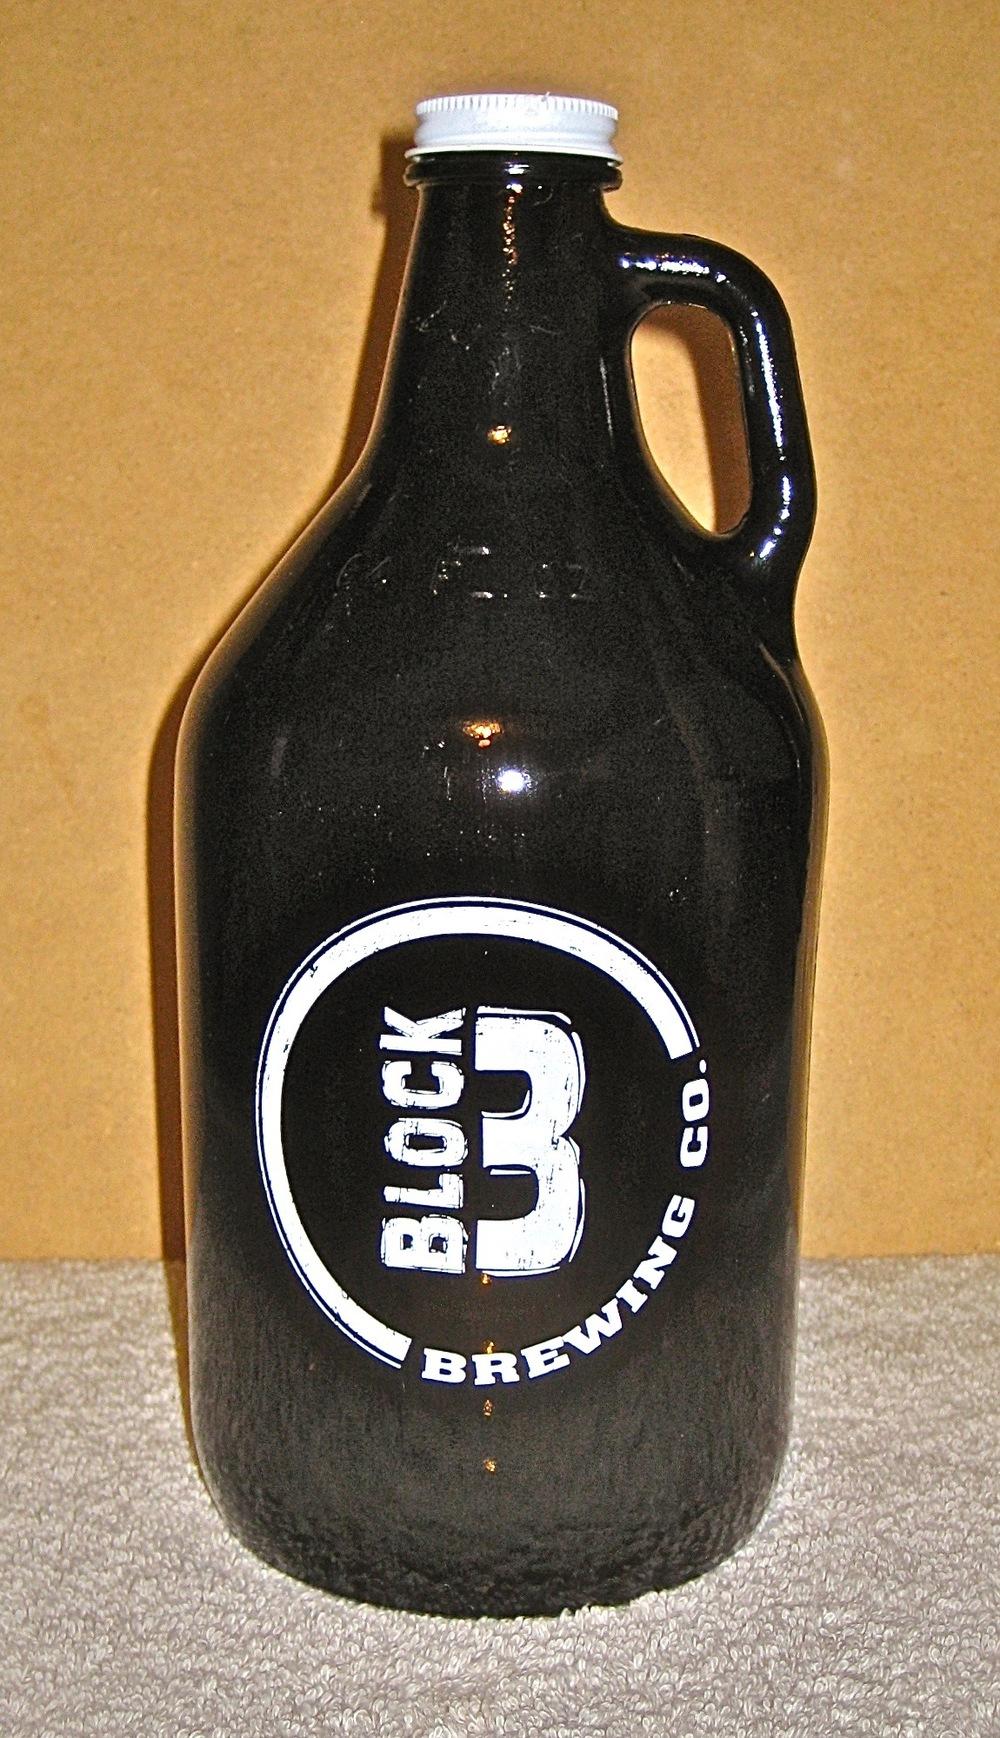 GR - Block 3 Brewing (ON).jpg